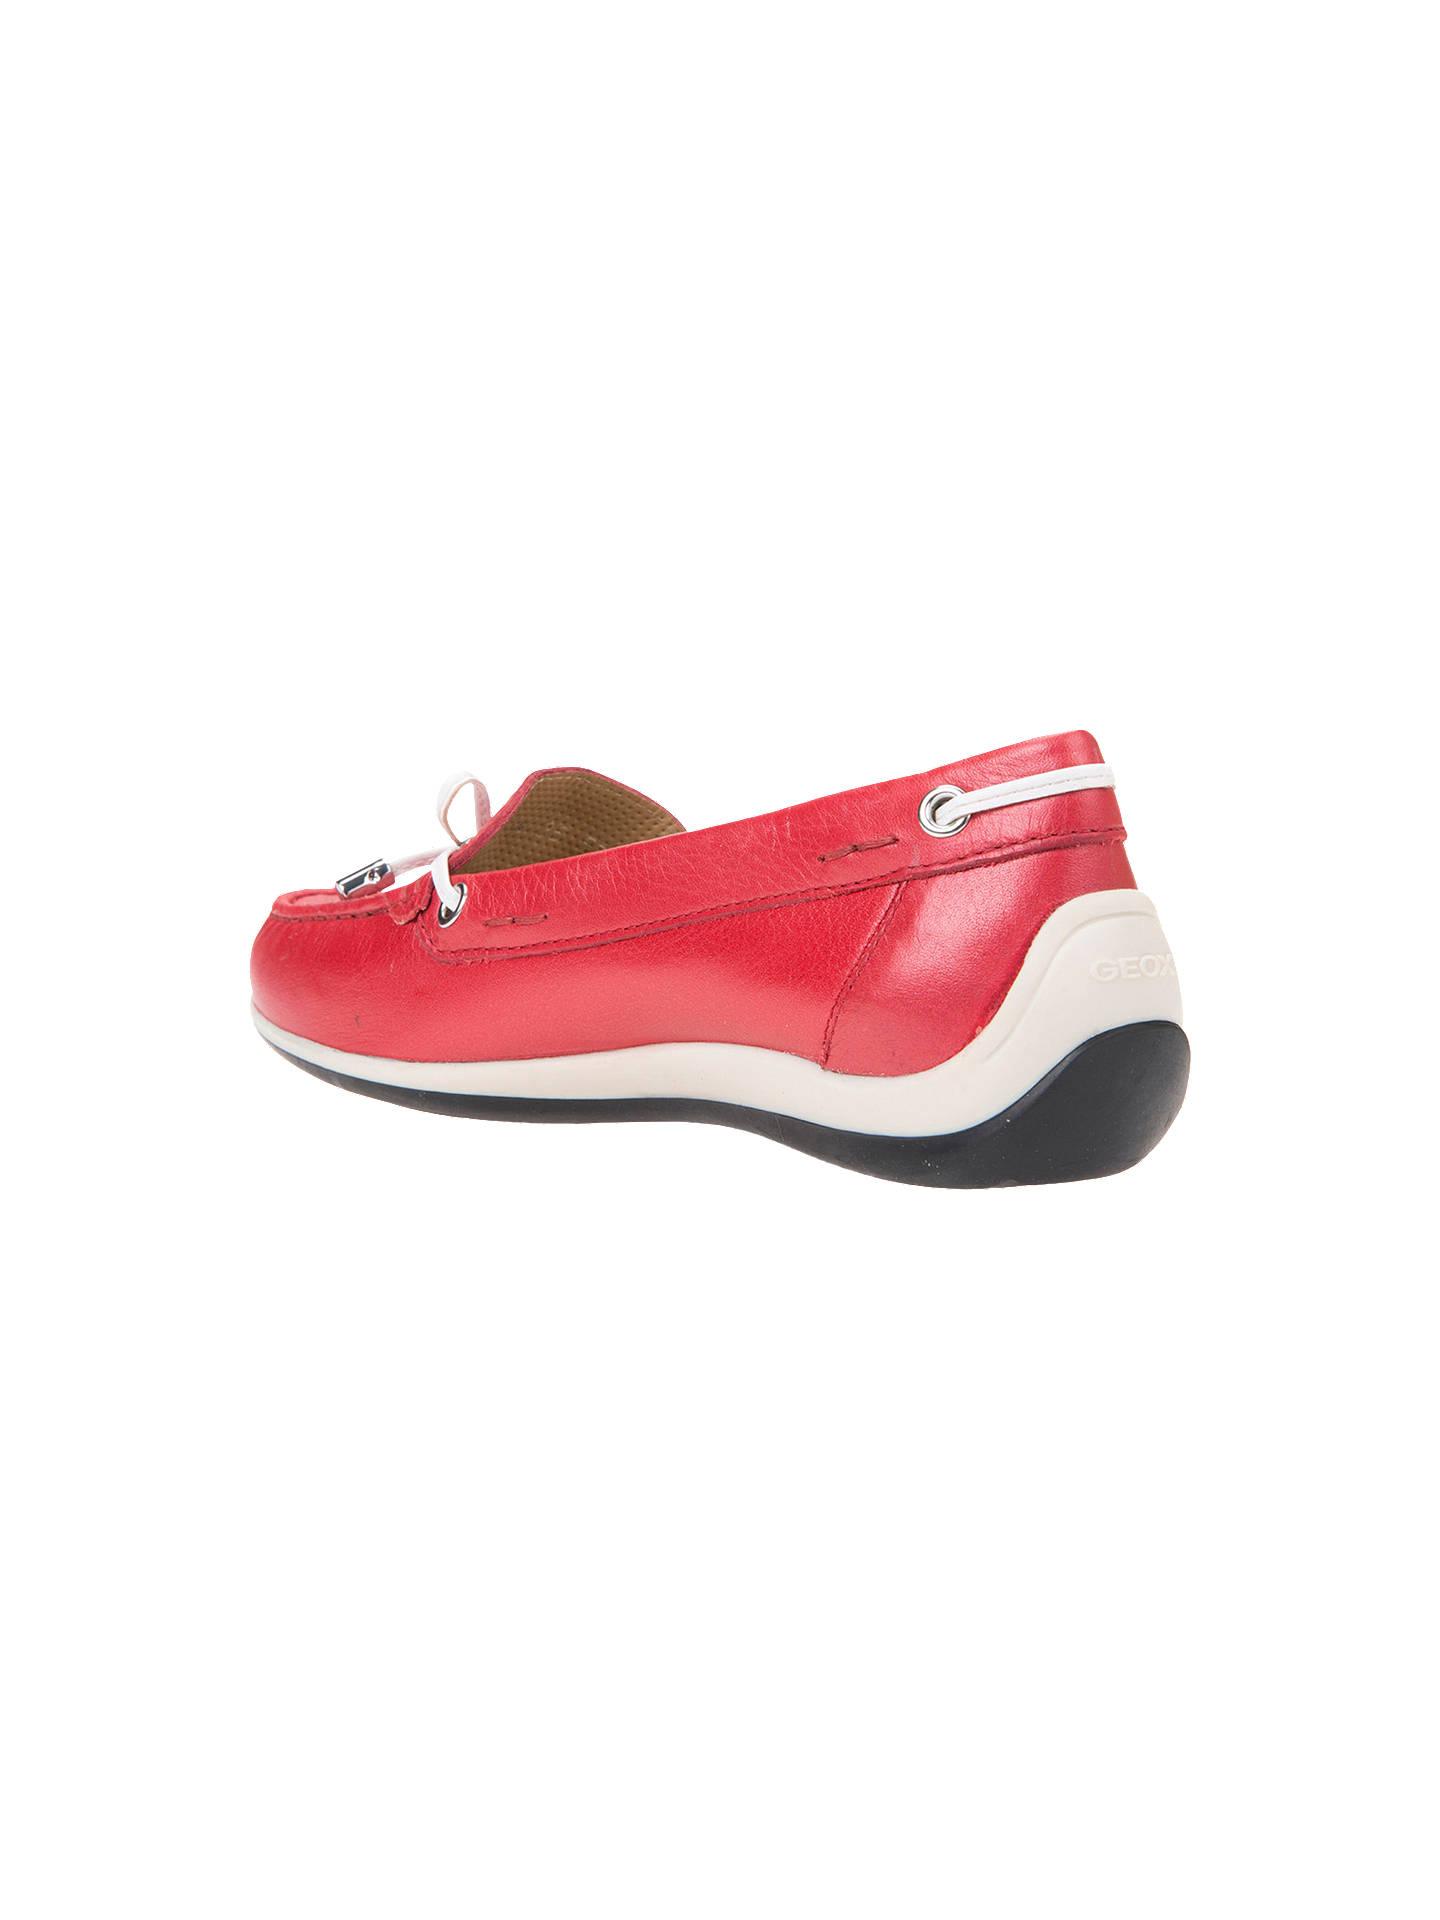 ea90692ace7 Geox Women s Yuki Flat Loafers at John Lewis   Partners